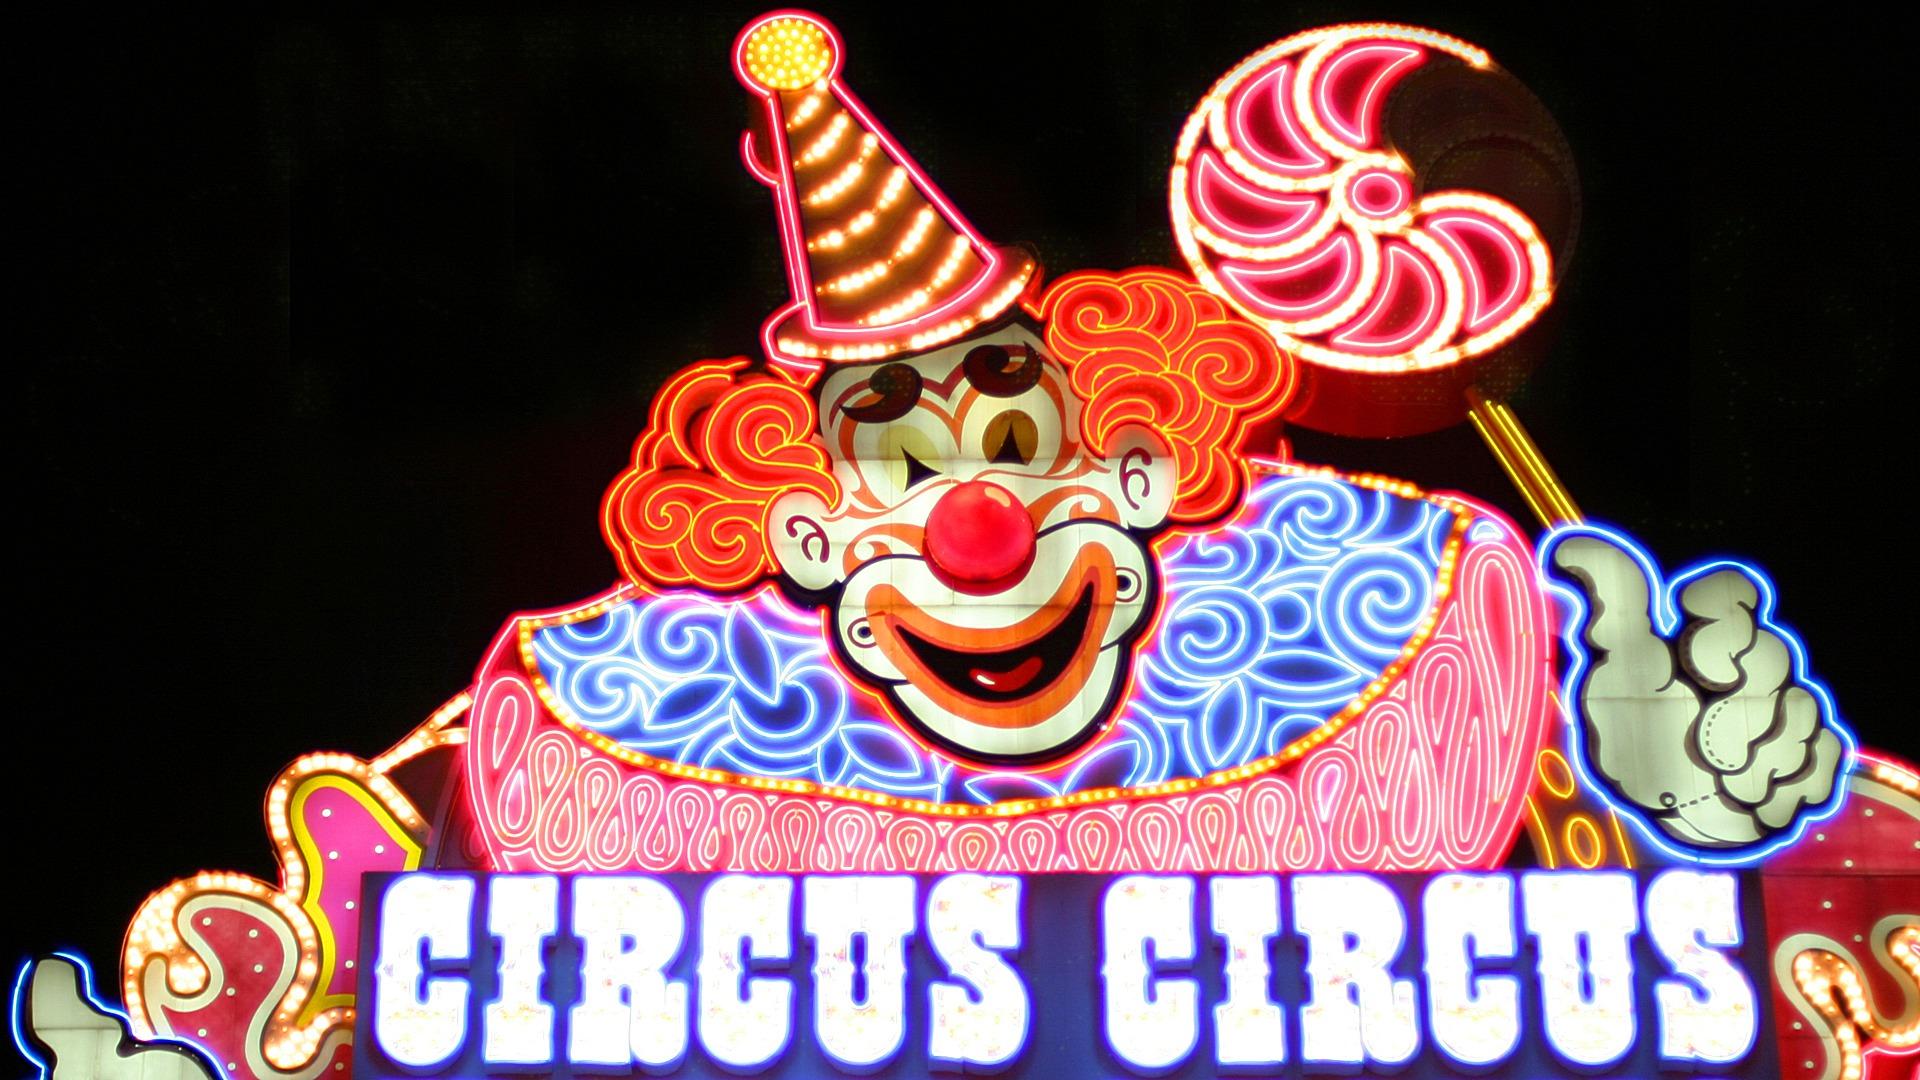 Circus circus las vegas casino official website barley casino las vegas nvse